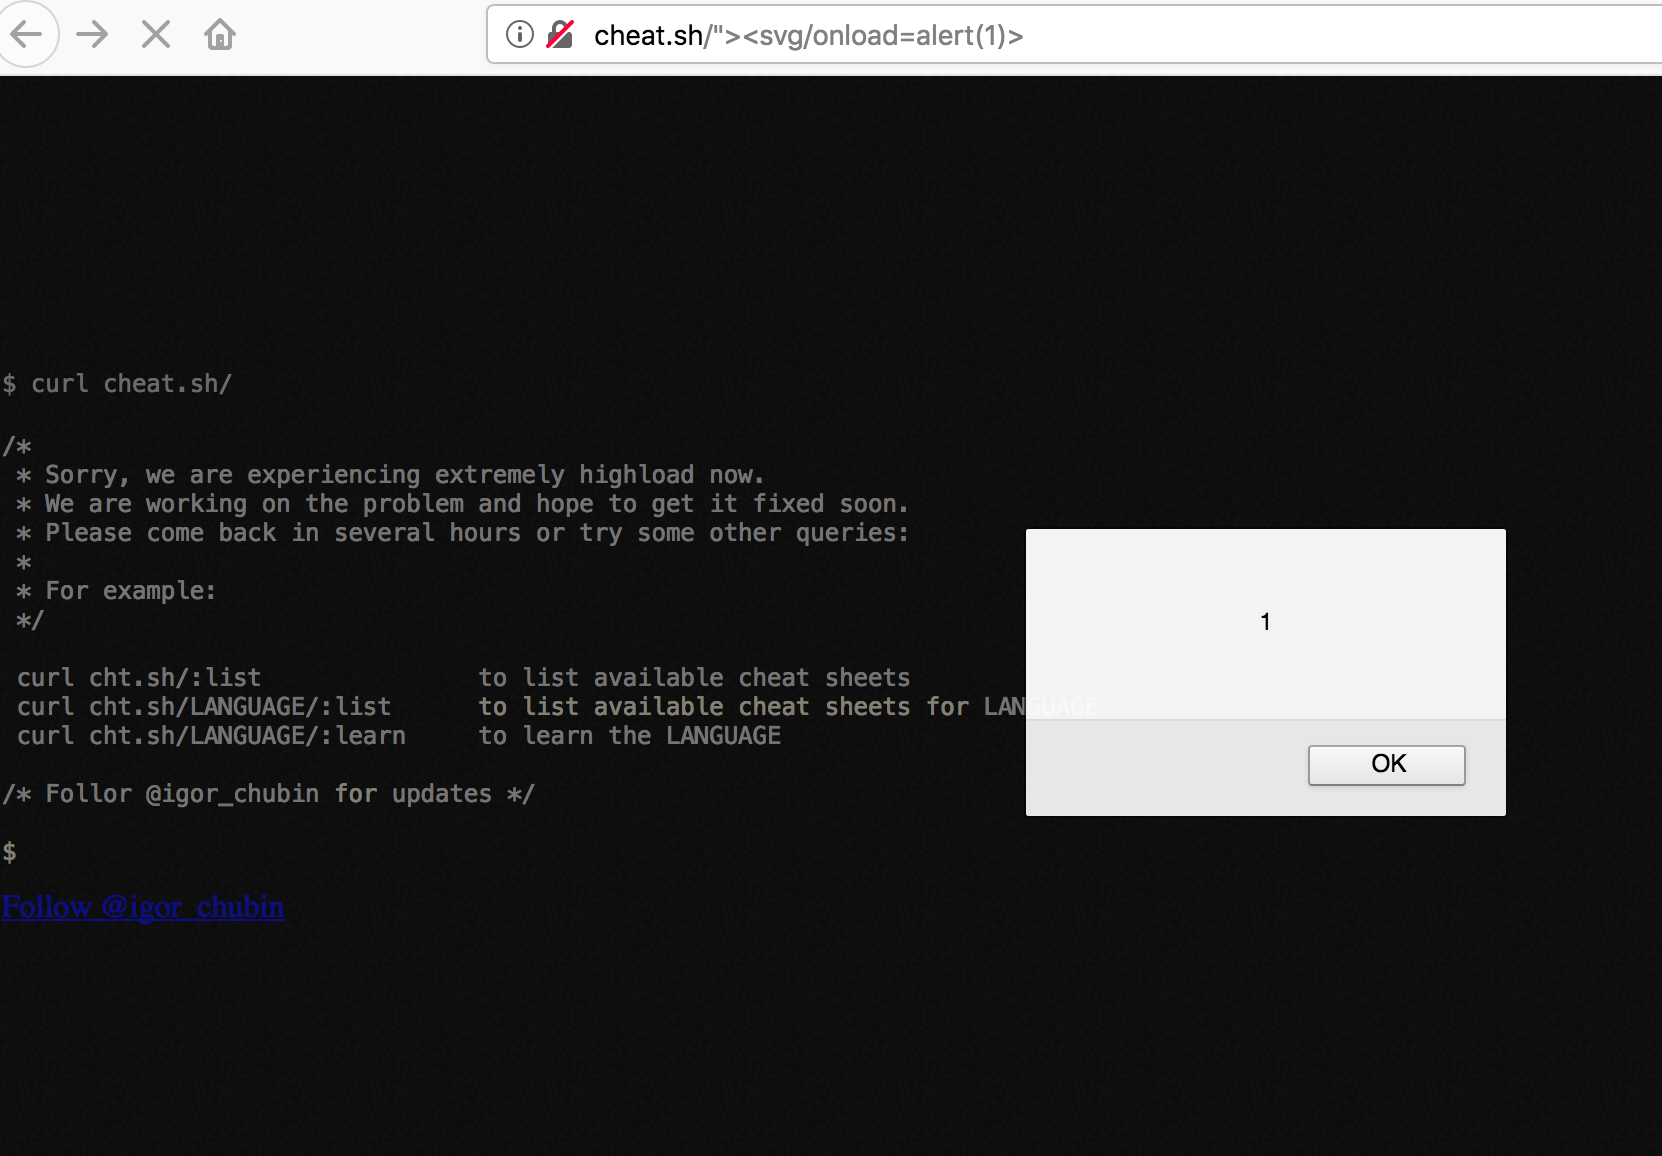 XSS vulnerability via command input in URL · Issue #56 · chubin